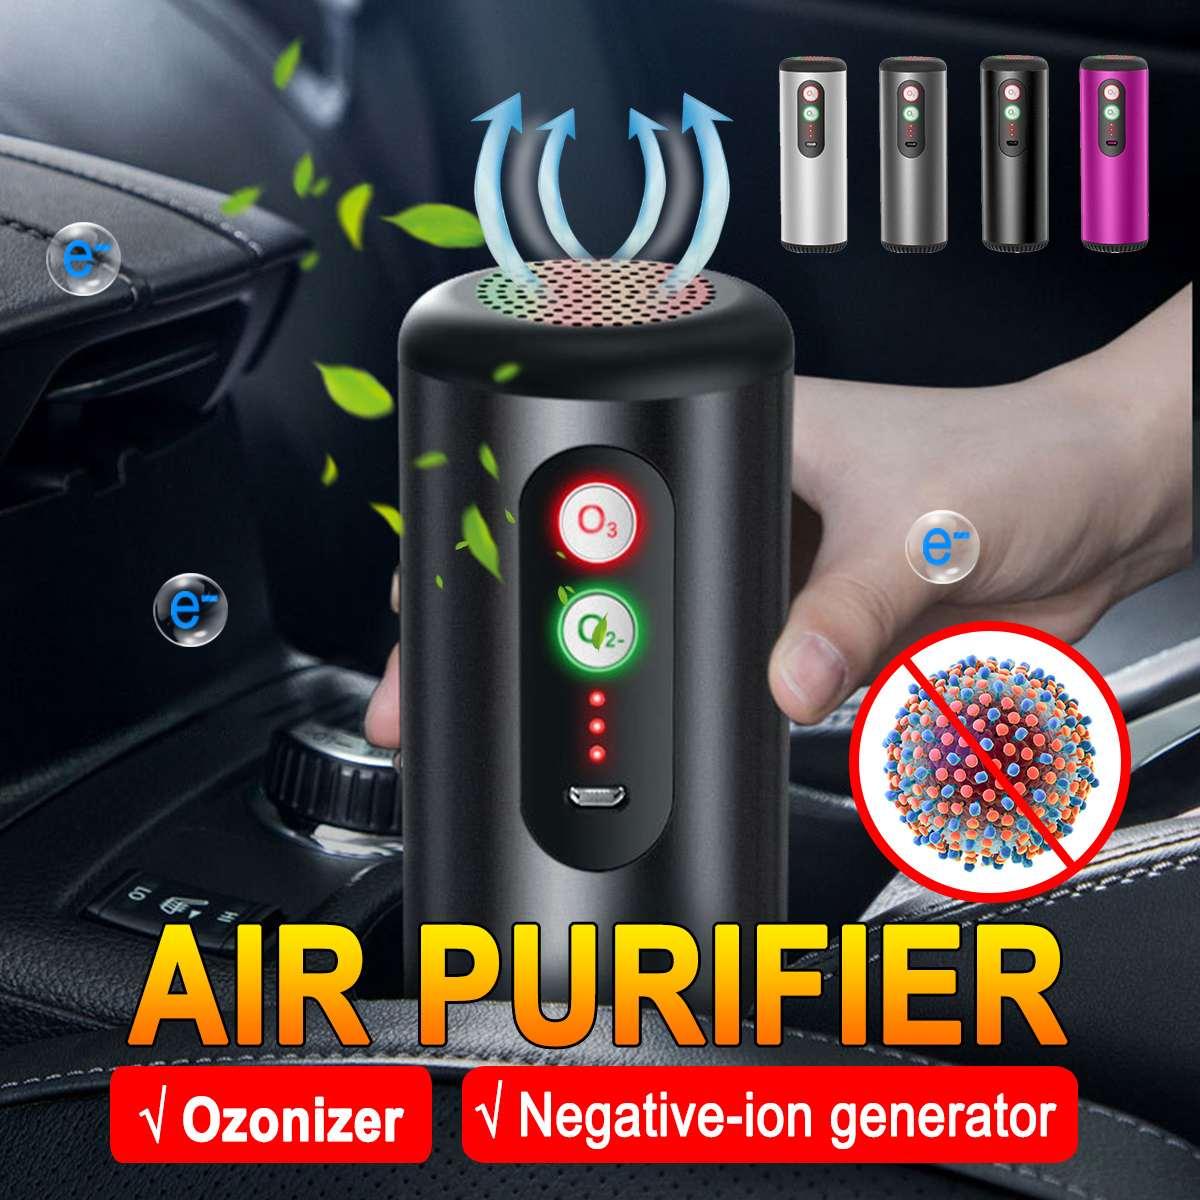 Air Ozonizer Portable Ozone Generator Air Purifier Anion Air Cleaner Sterilization Disinfection for Car Home Office Air Purifier